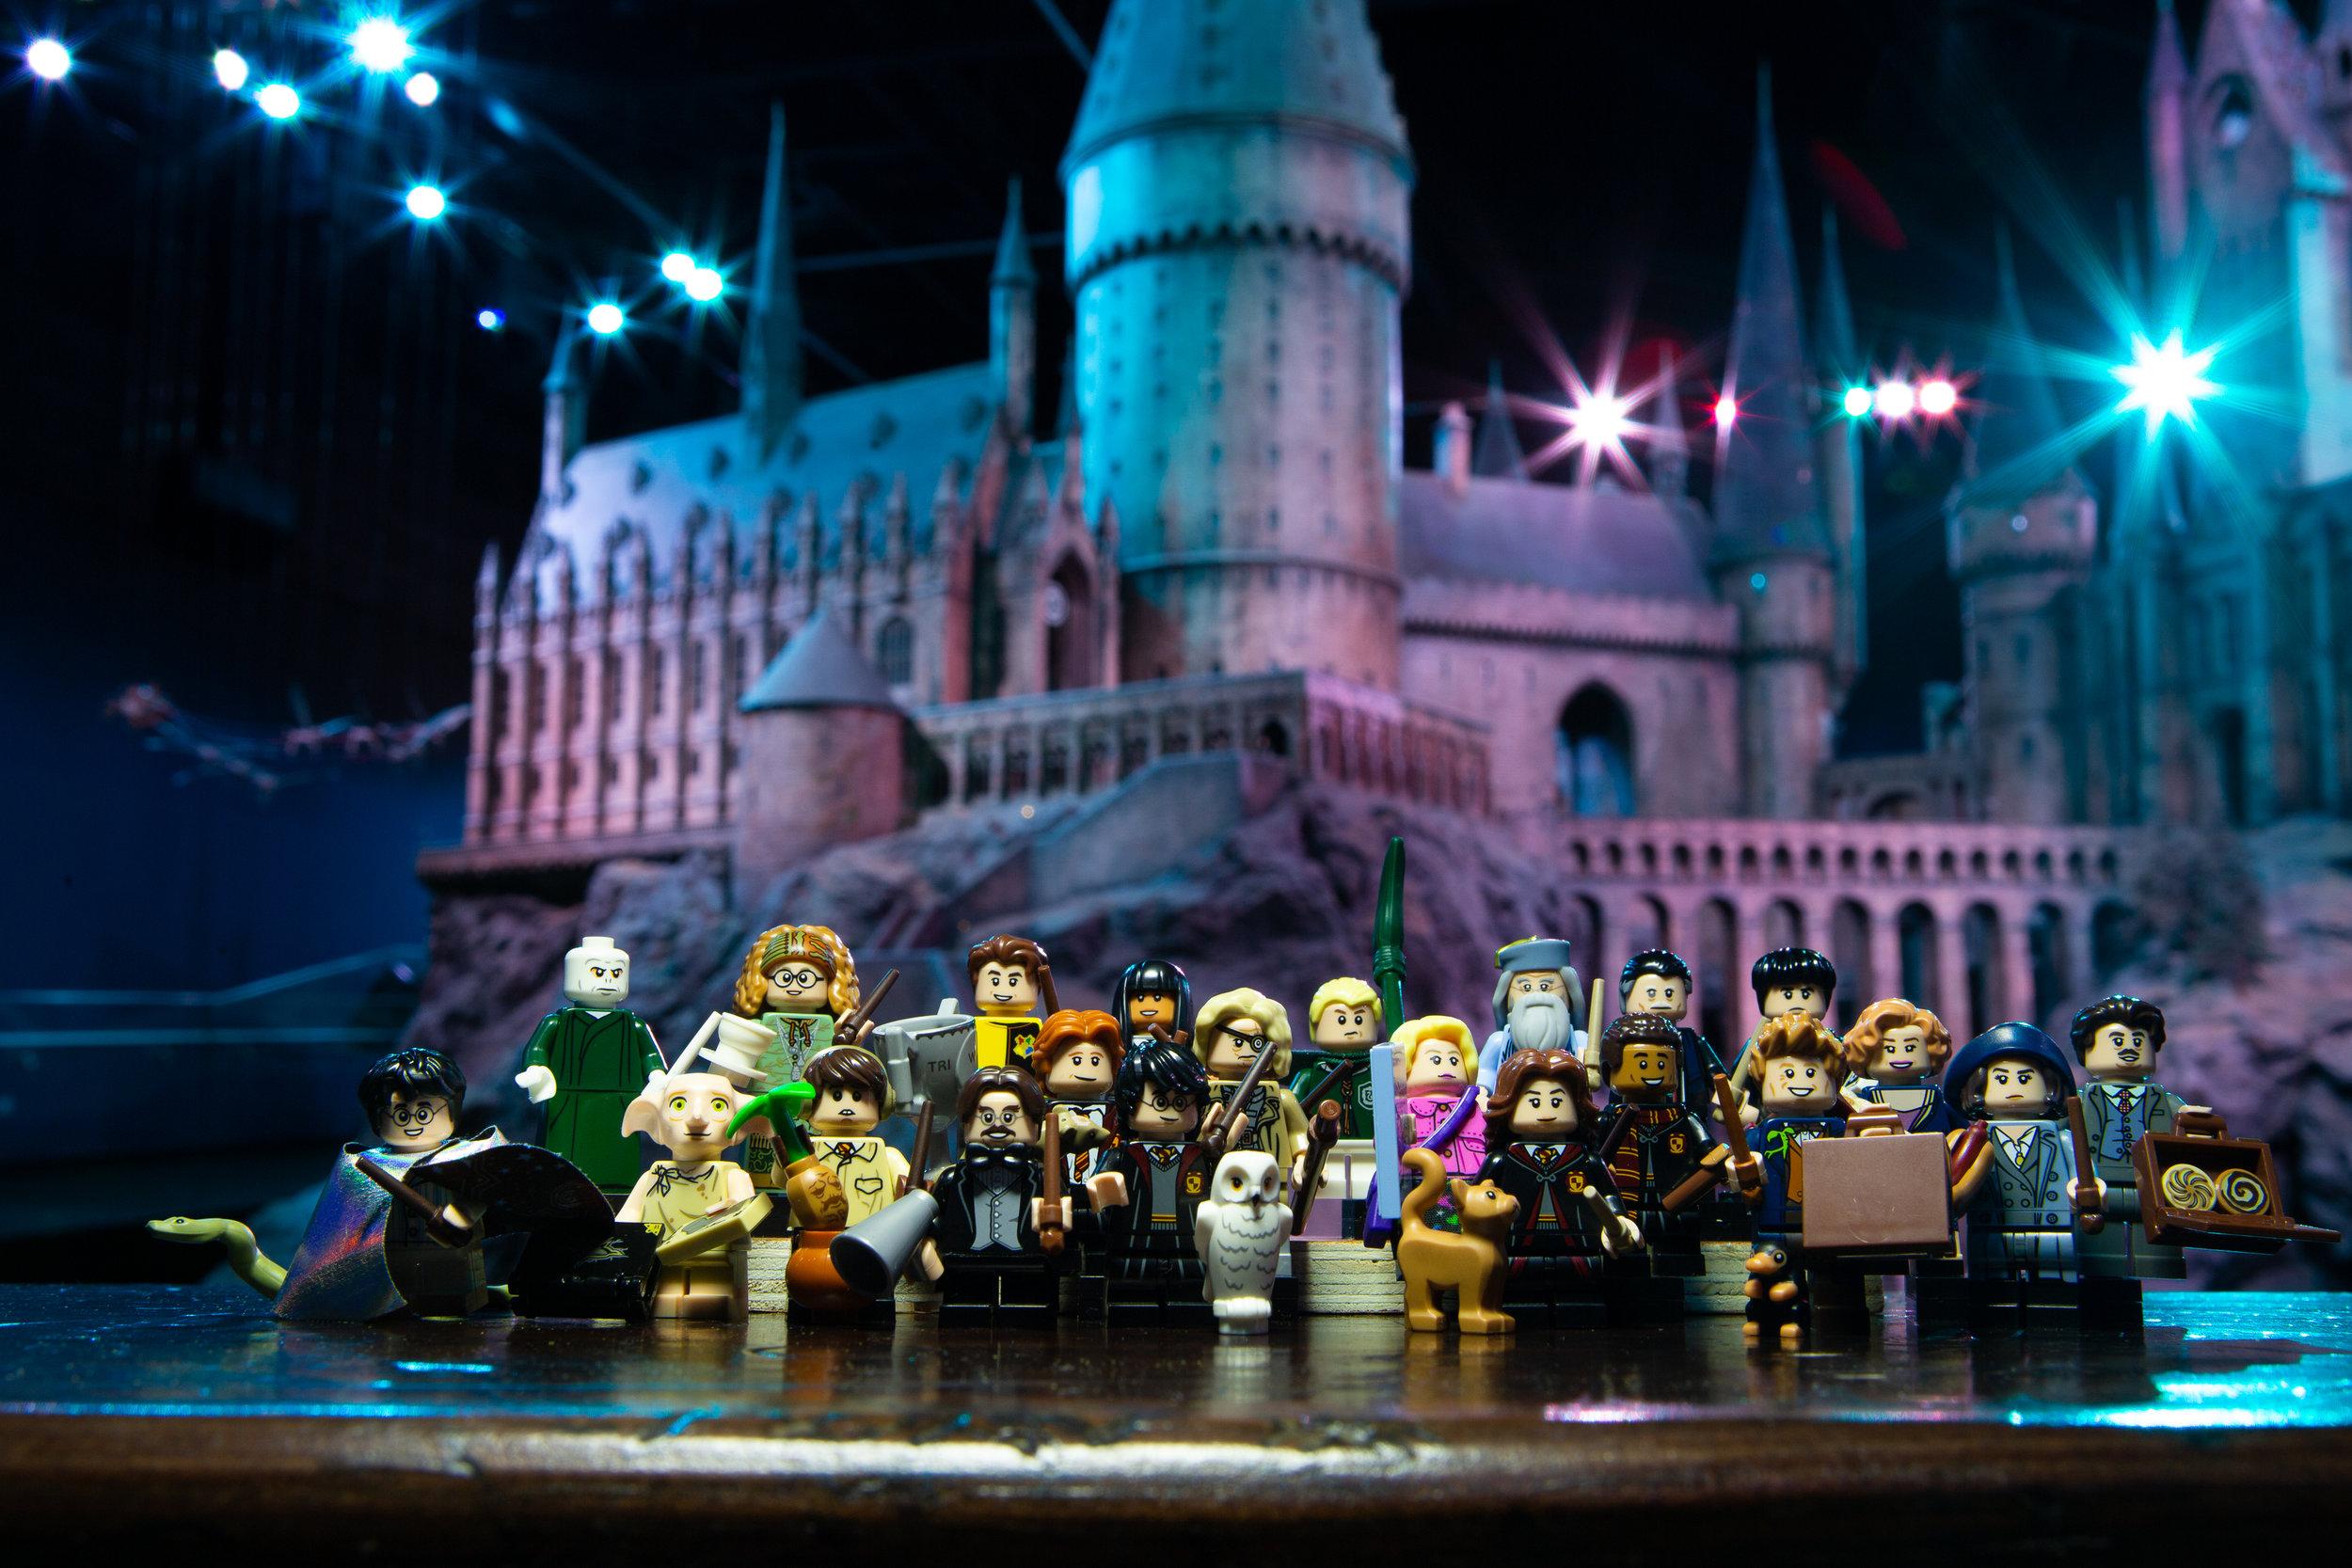 LEGO_WBST_19.06.18_hi-res-38.jpg